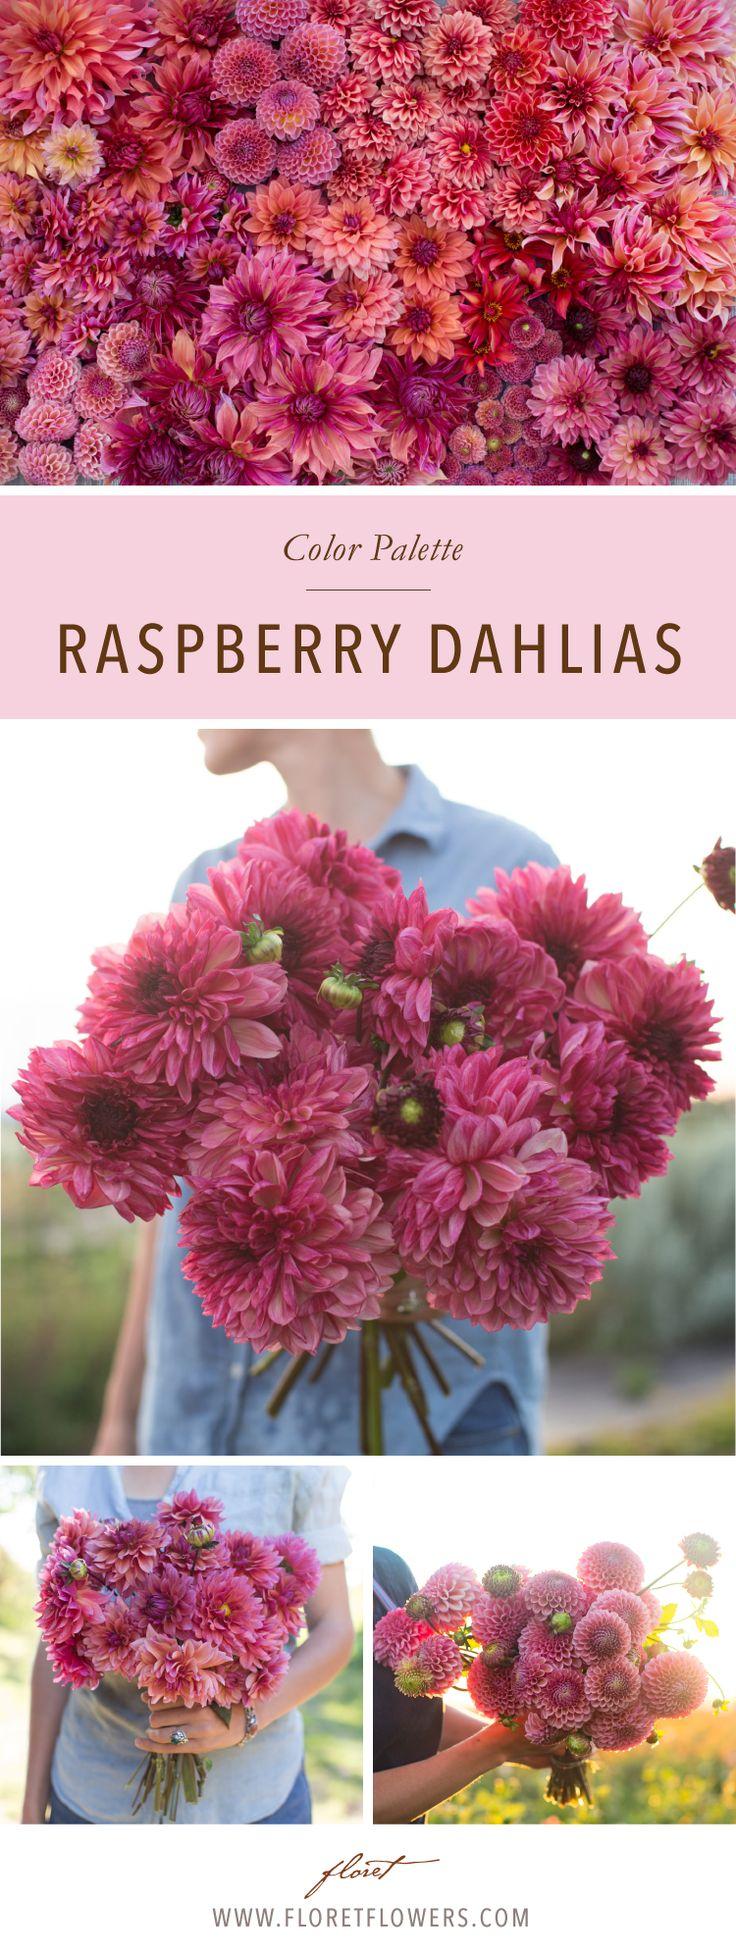 Floret's favorite dahlias in raspberry hues include:  Jowey Winnie, Mystique, Labyrinth, Penhill Dark Monarch, Koko Puff, Bacardi, Waltzing Mathilda Bracken Rose, Sonic Bloom.